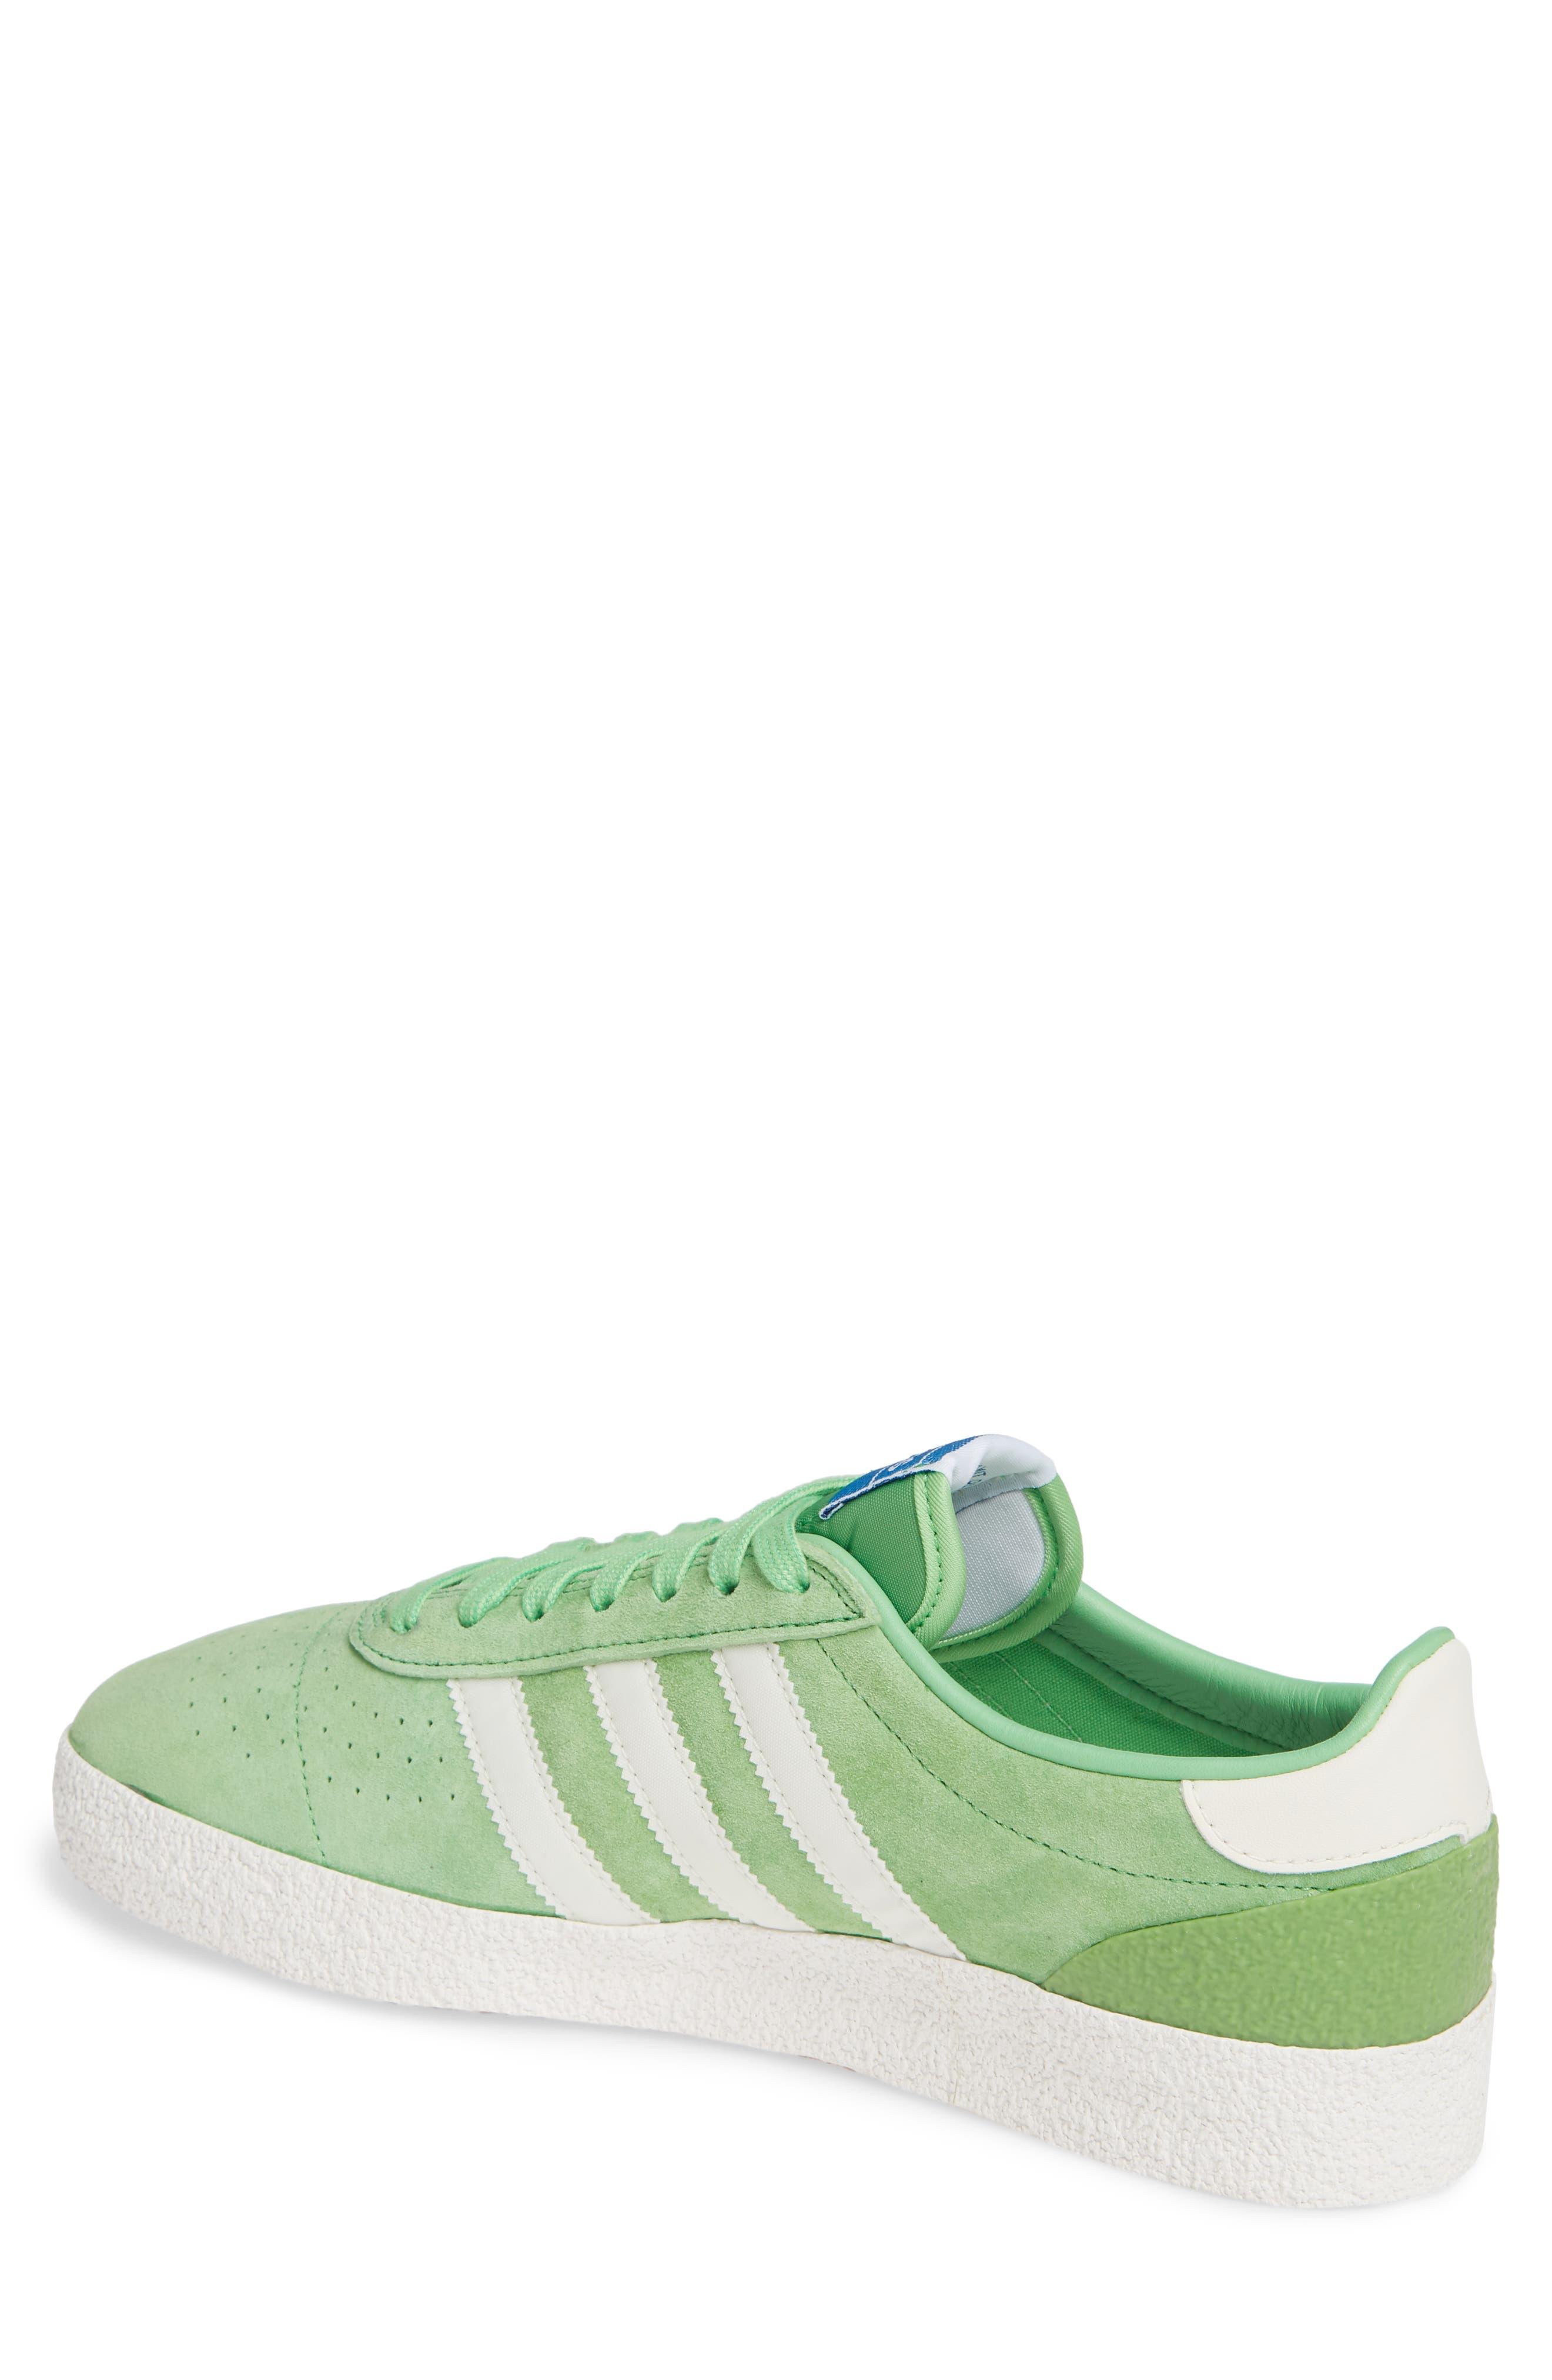 München Super Spezial Sneaker,                             Alternate thumbnail 2, color,                             INTENSE GREEN/ OFF WHITE